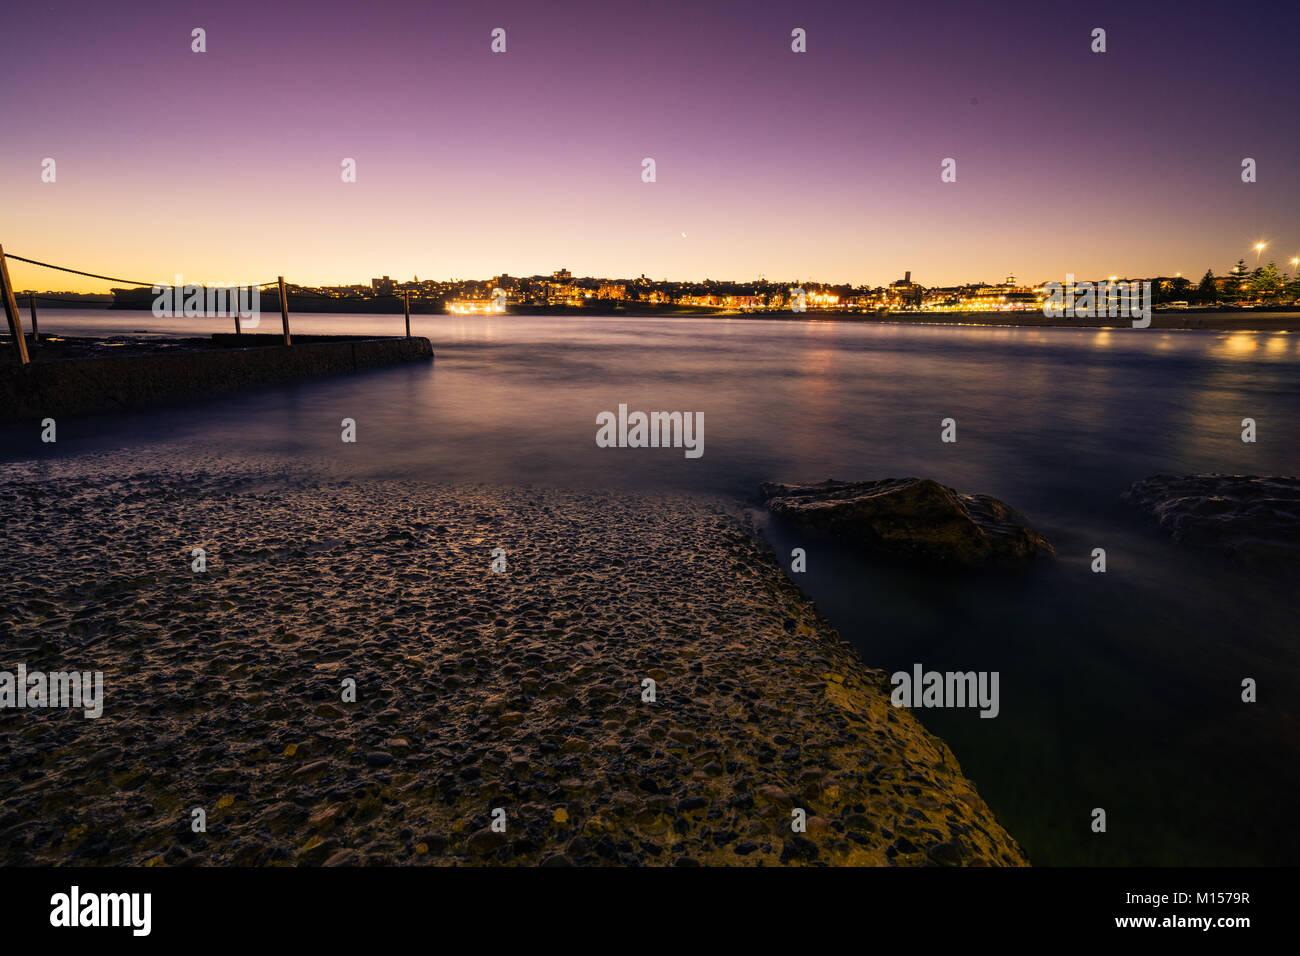 Bondi beach sunset - Stock Image